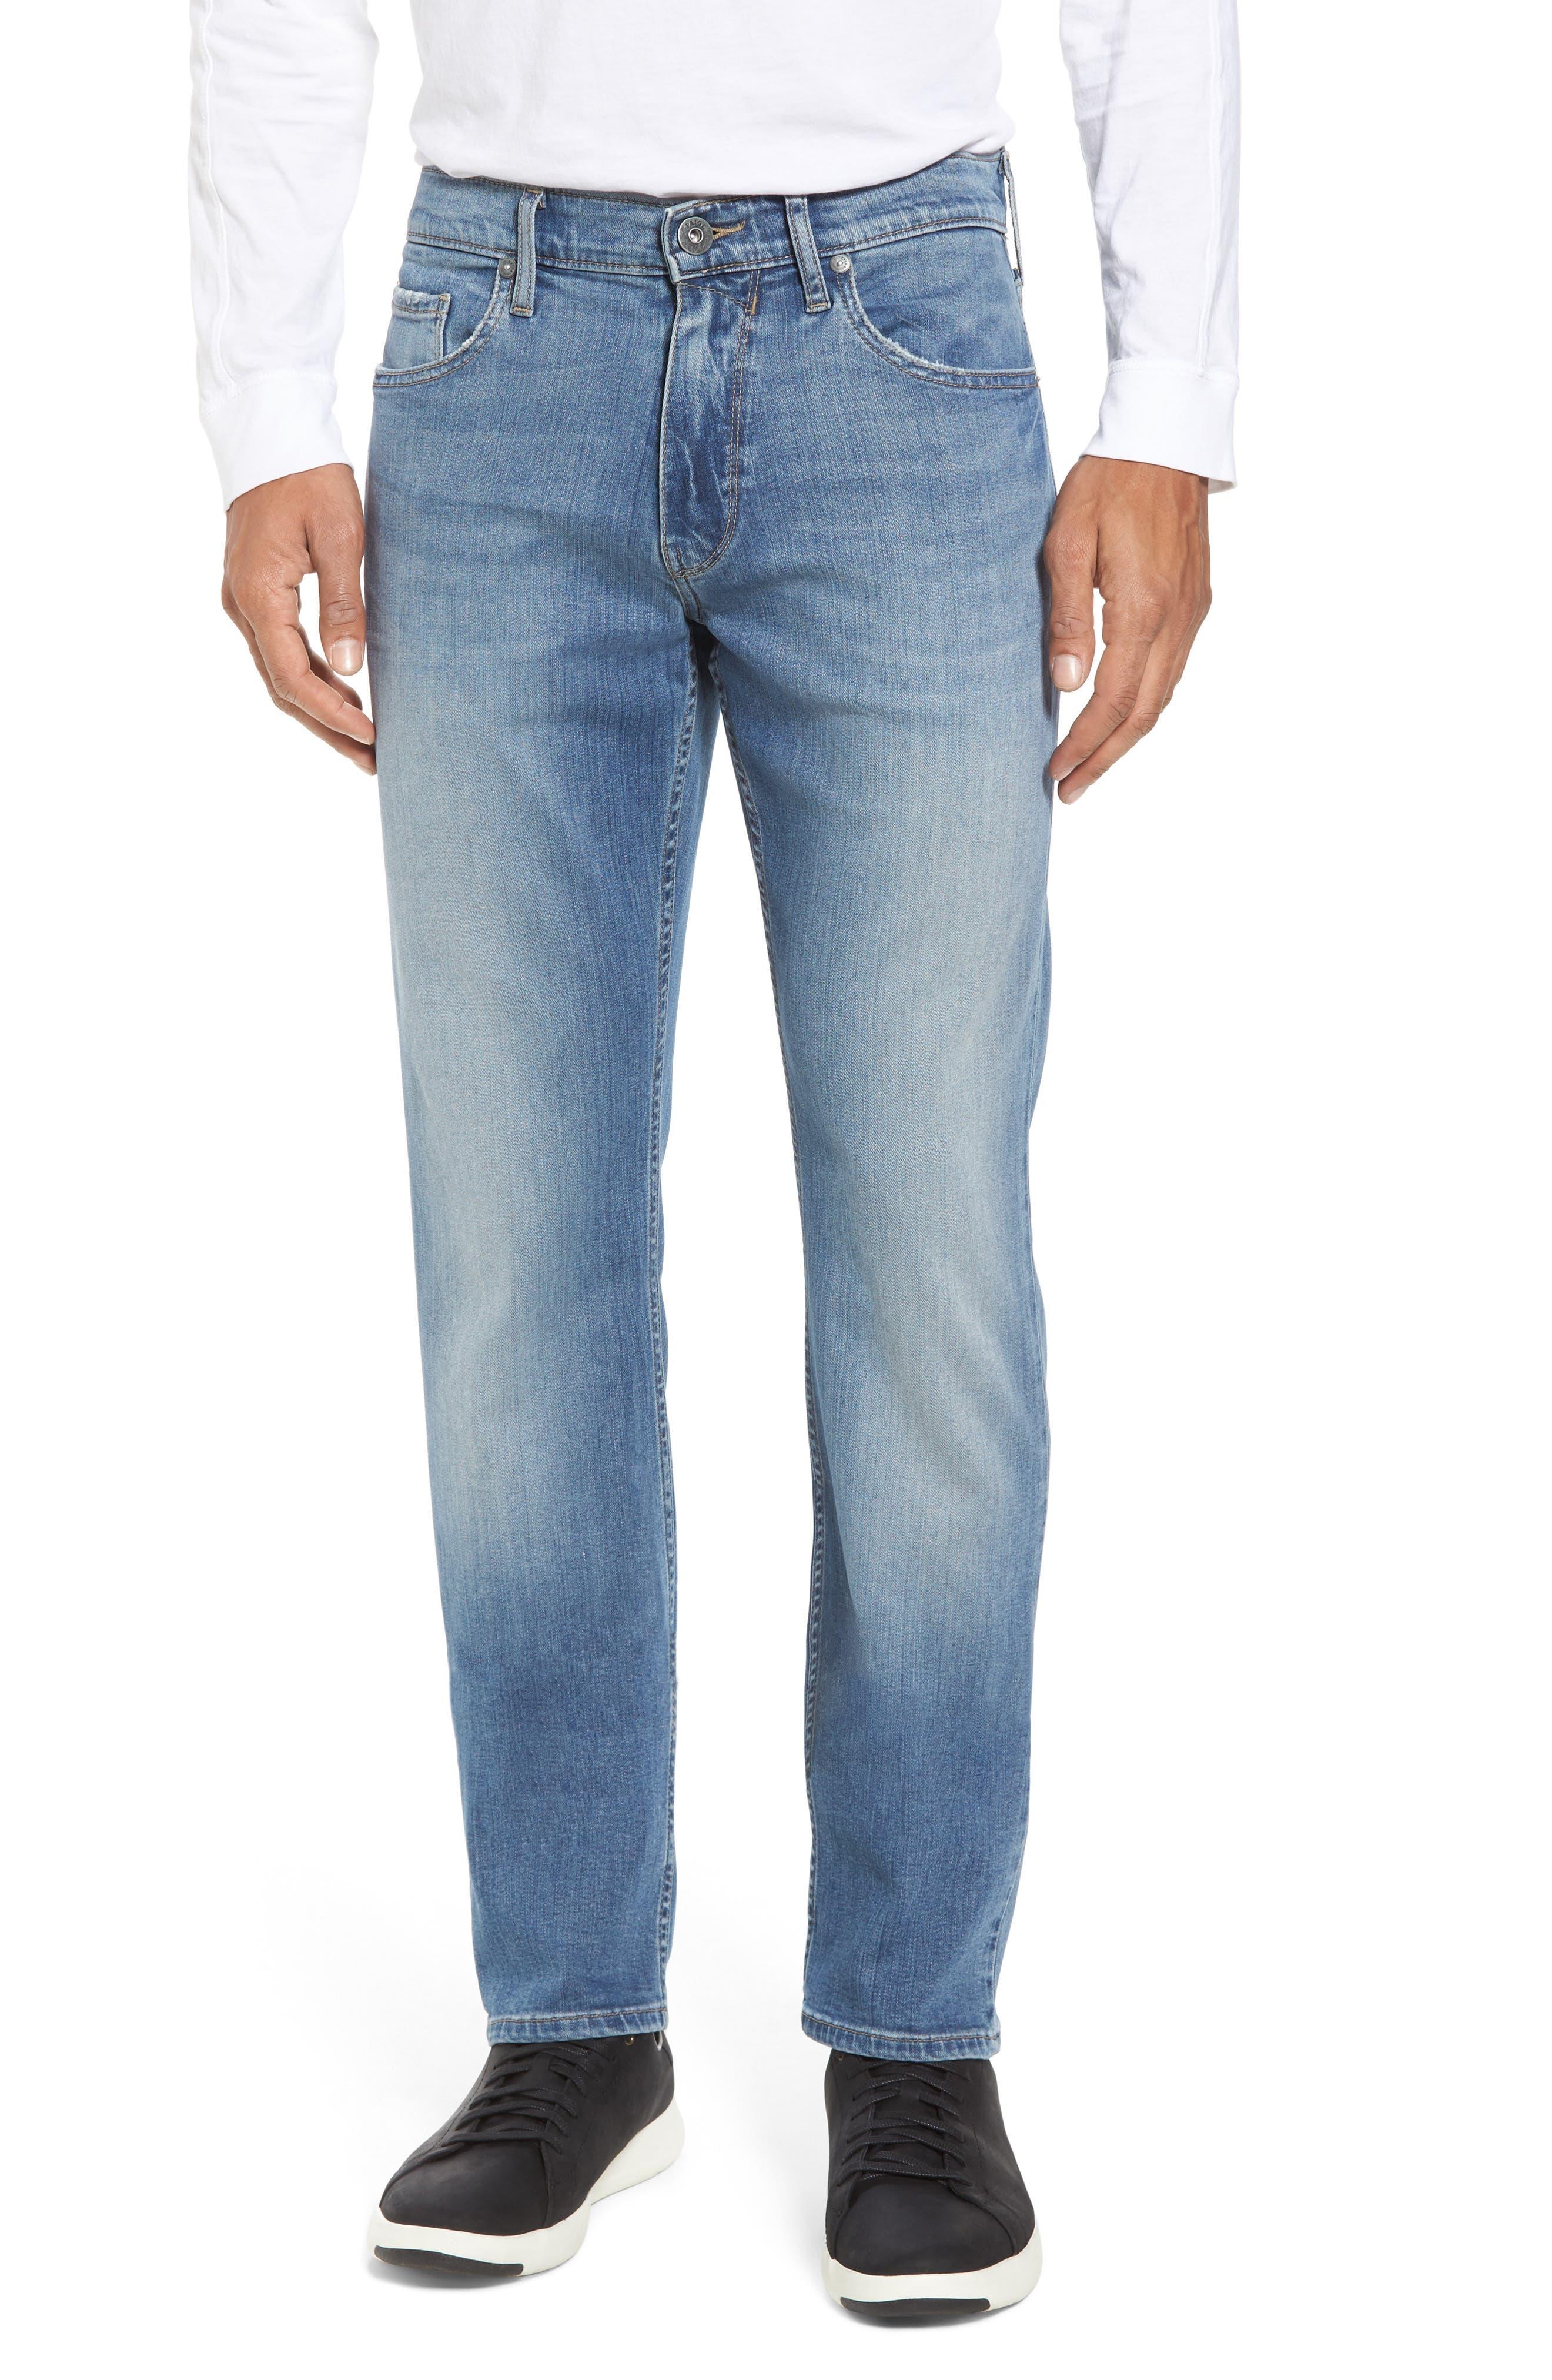 Alternate Image 1 Selected - PAIGE Transcend - Federal Slim Straight Fit Jeans (Oakland)